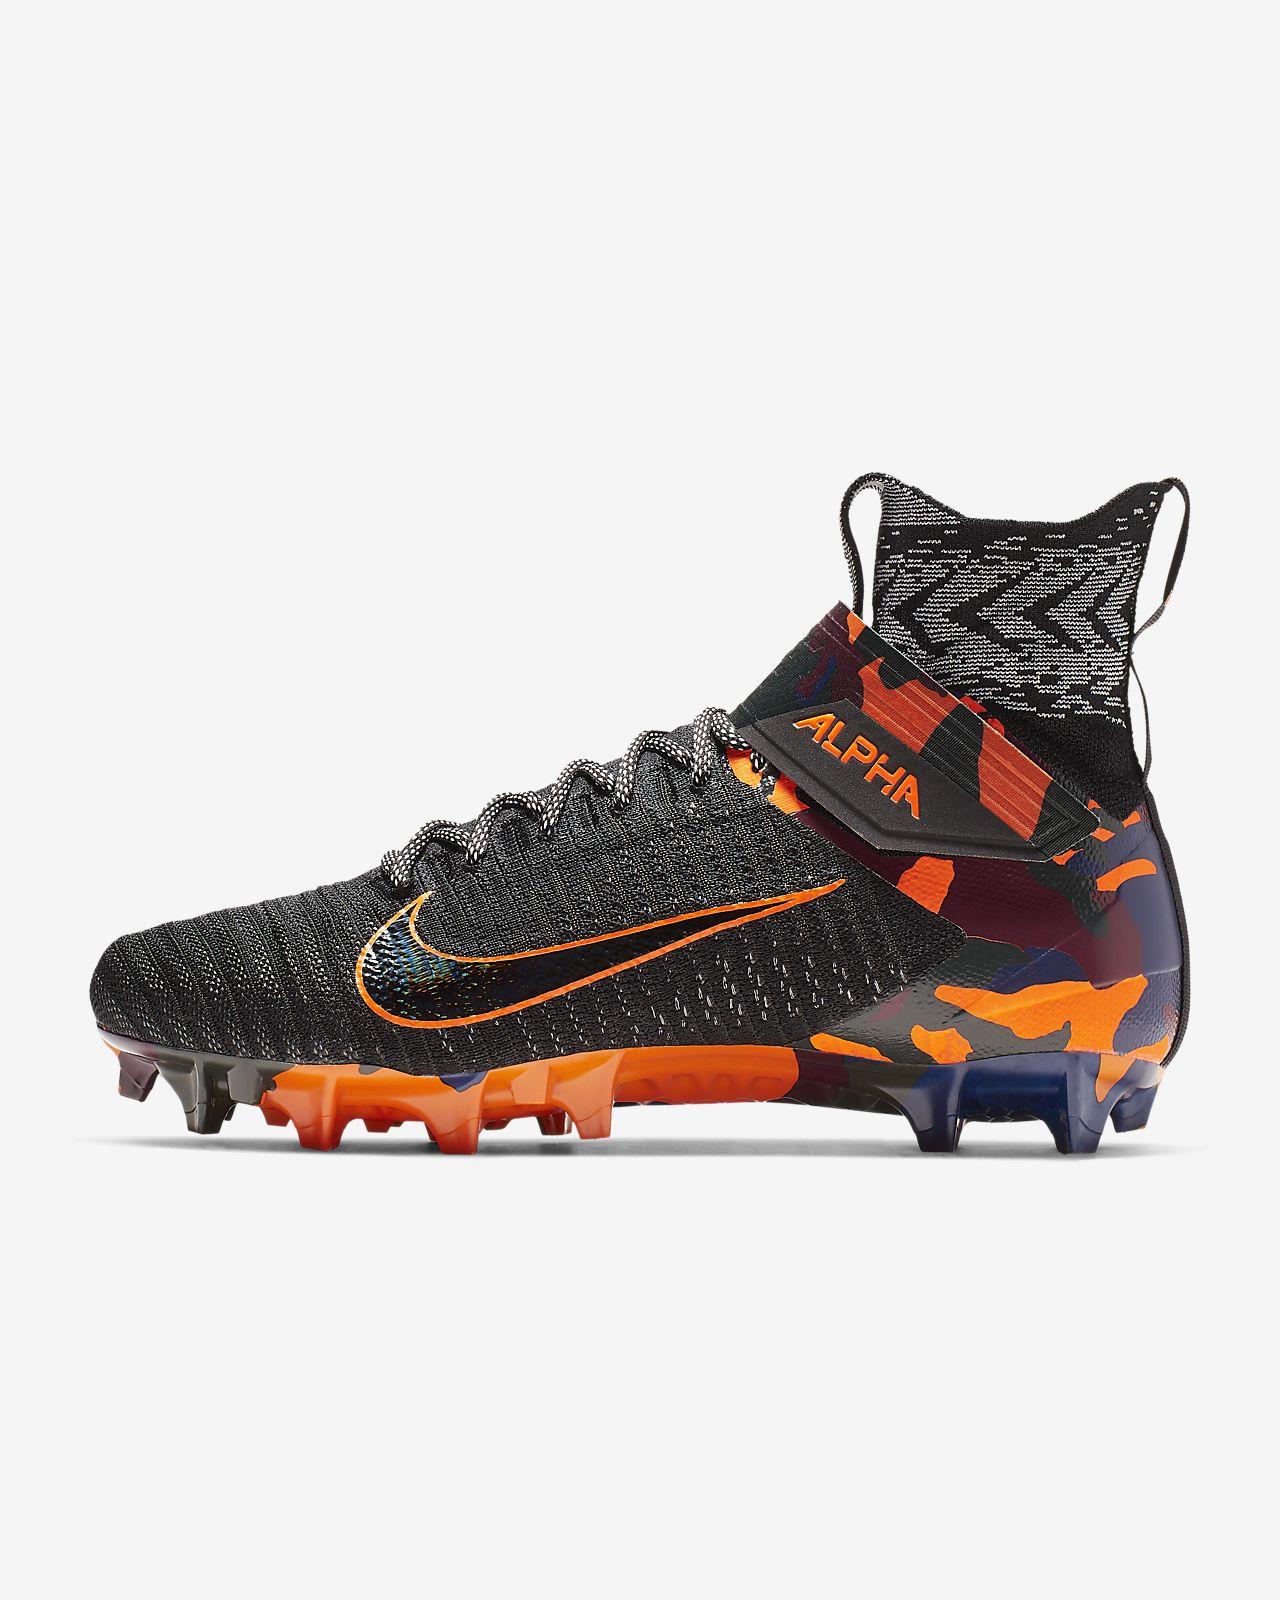 004a33808664 Nike Alpha Menace Elite 2 Men's Football Cleat. Nike.com